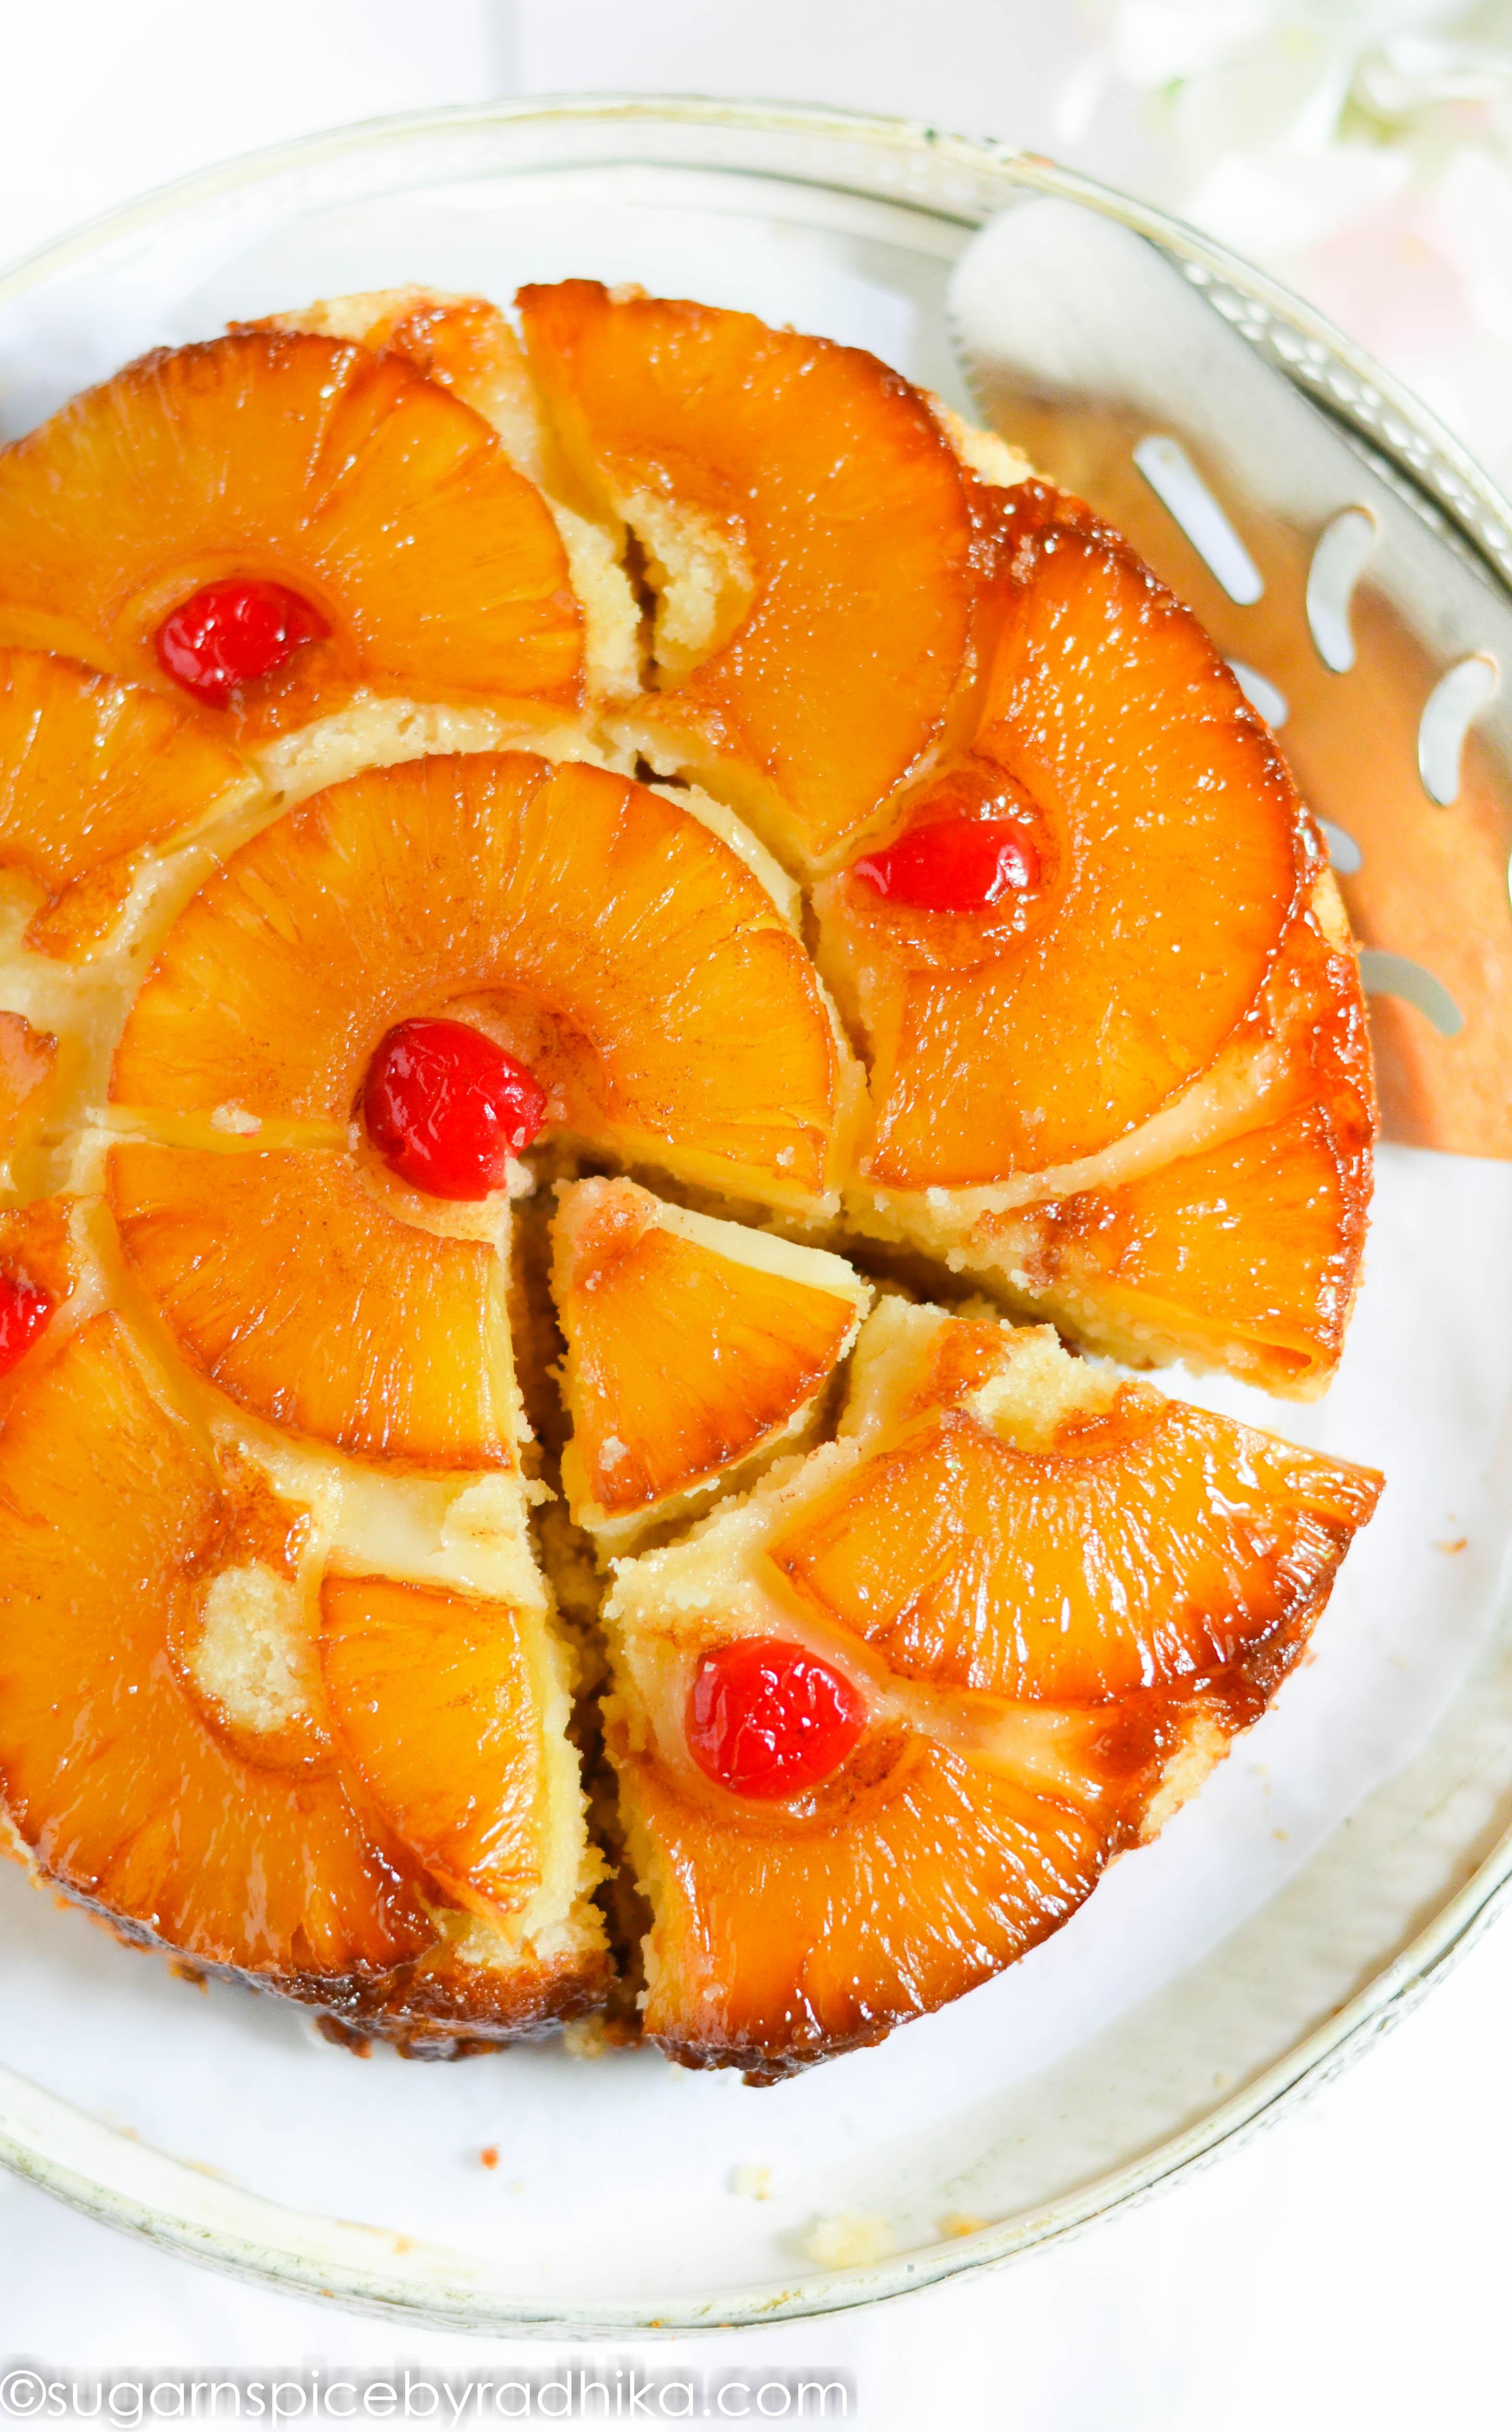 Pineapple Upside Down Cake (eggless)